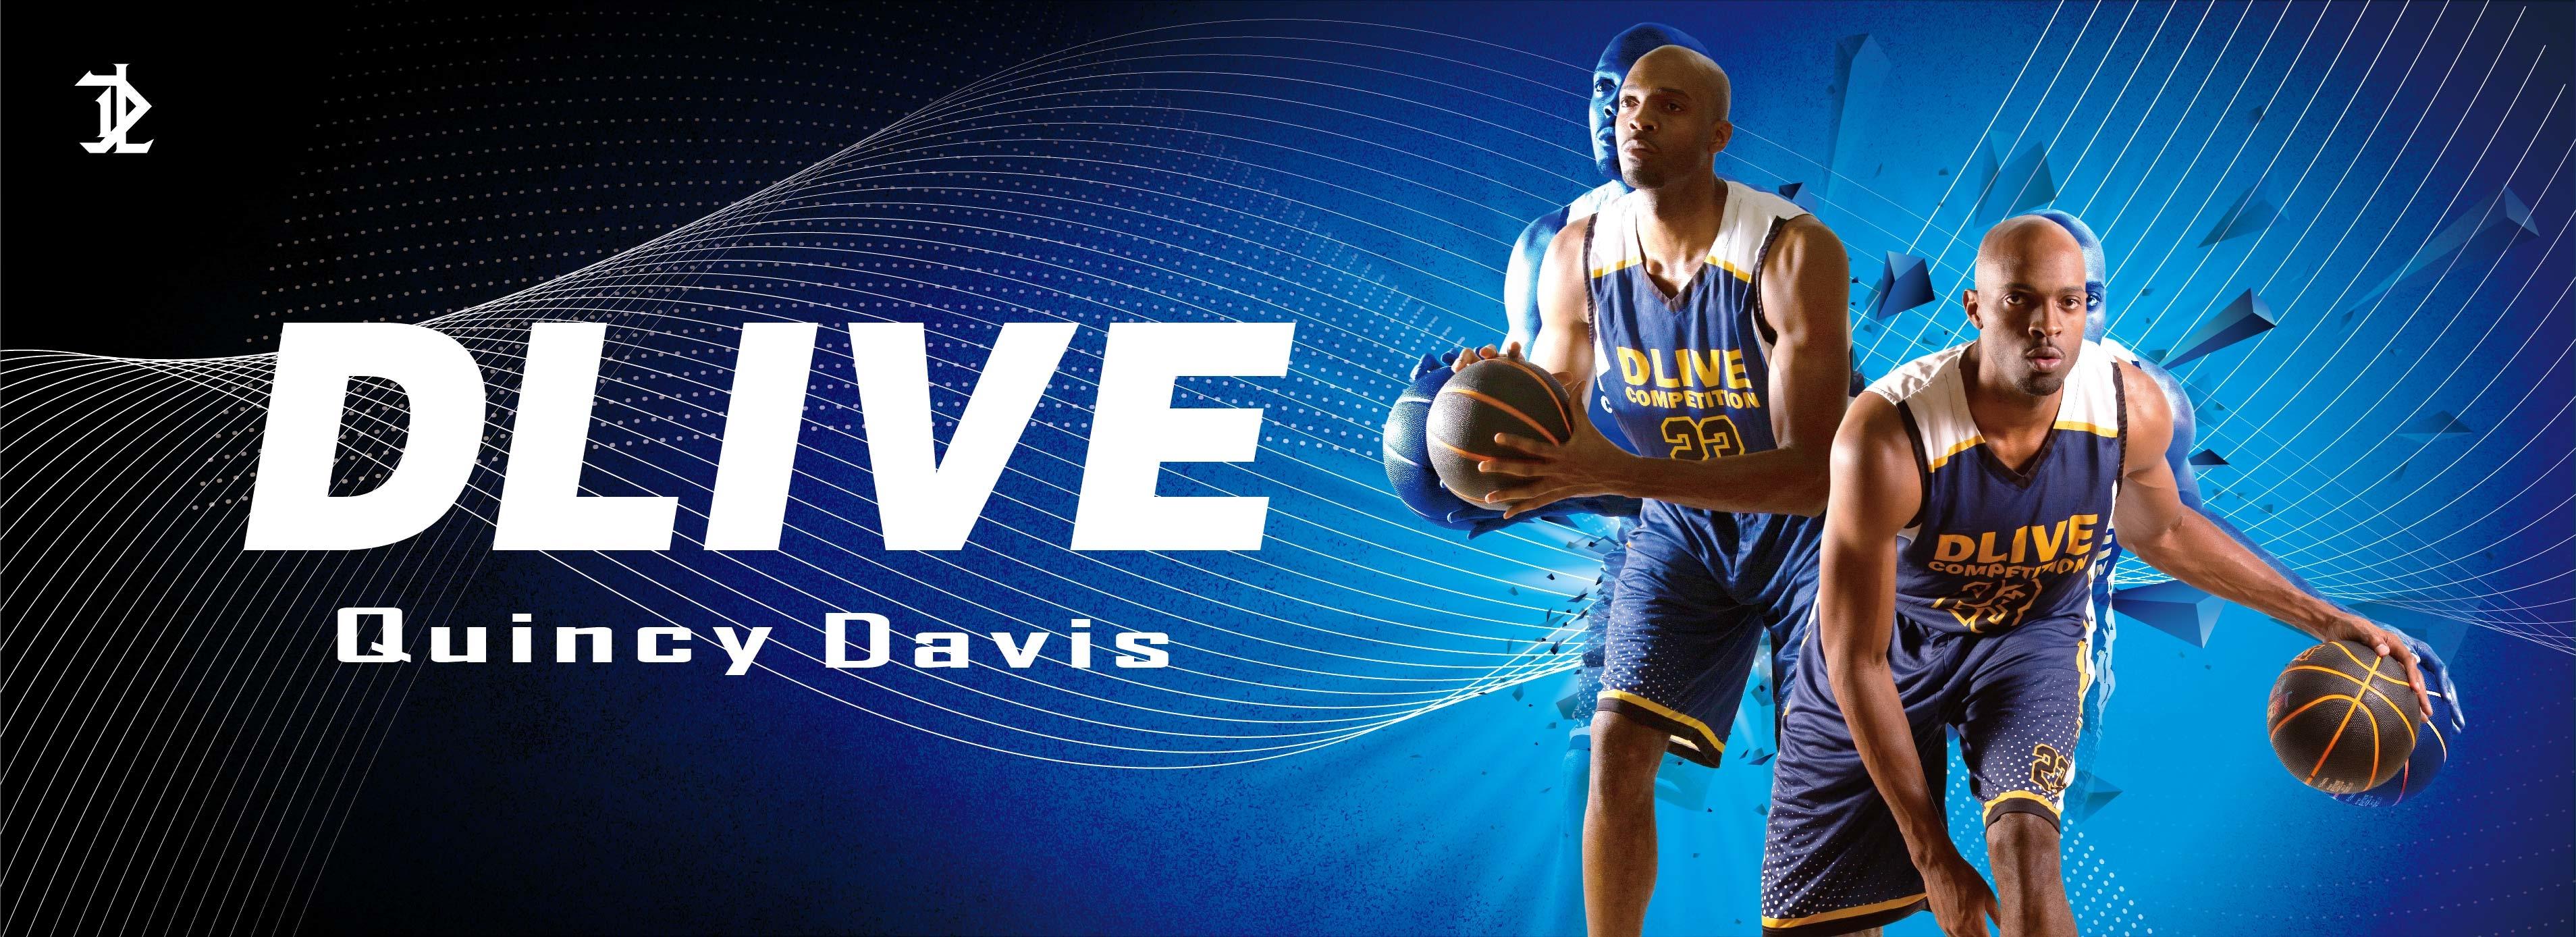 D-LIVE Cover-QDavis